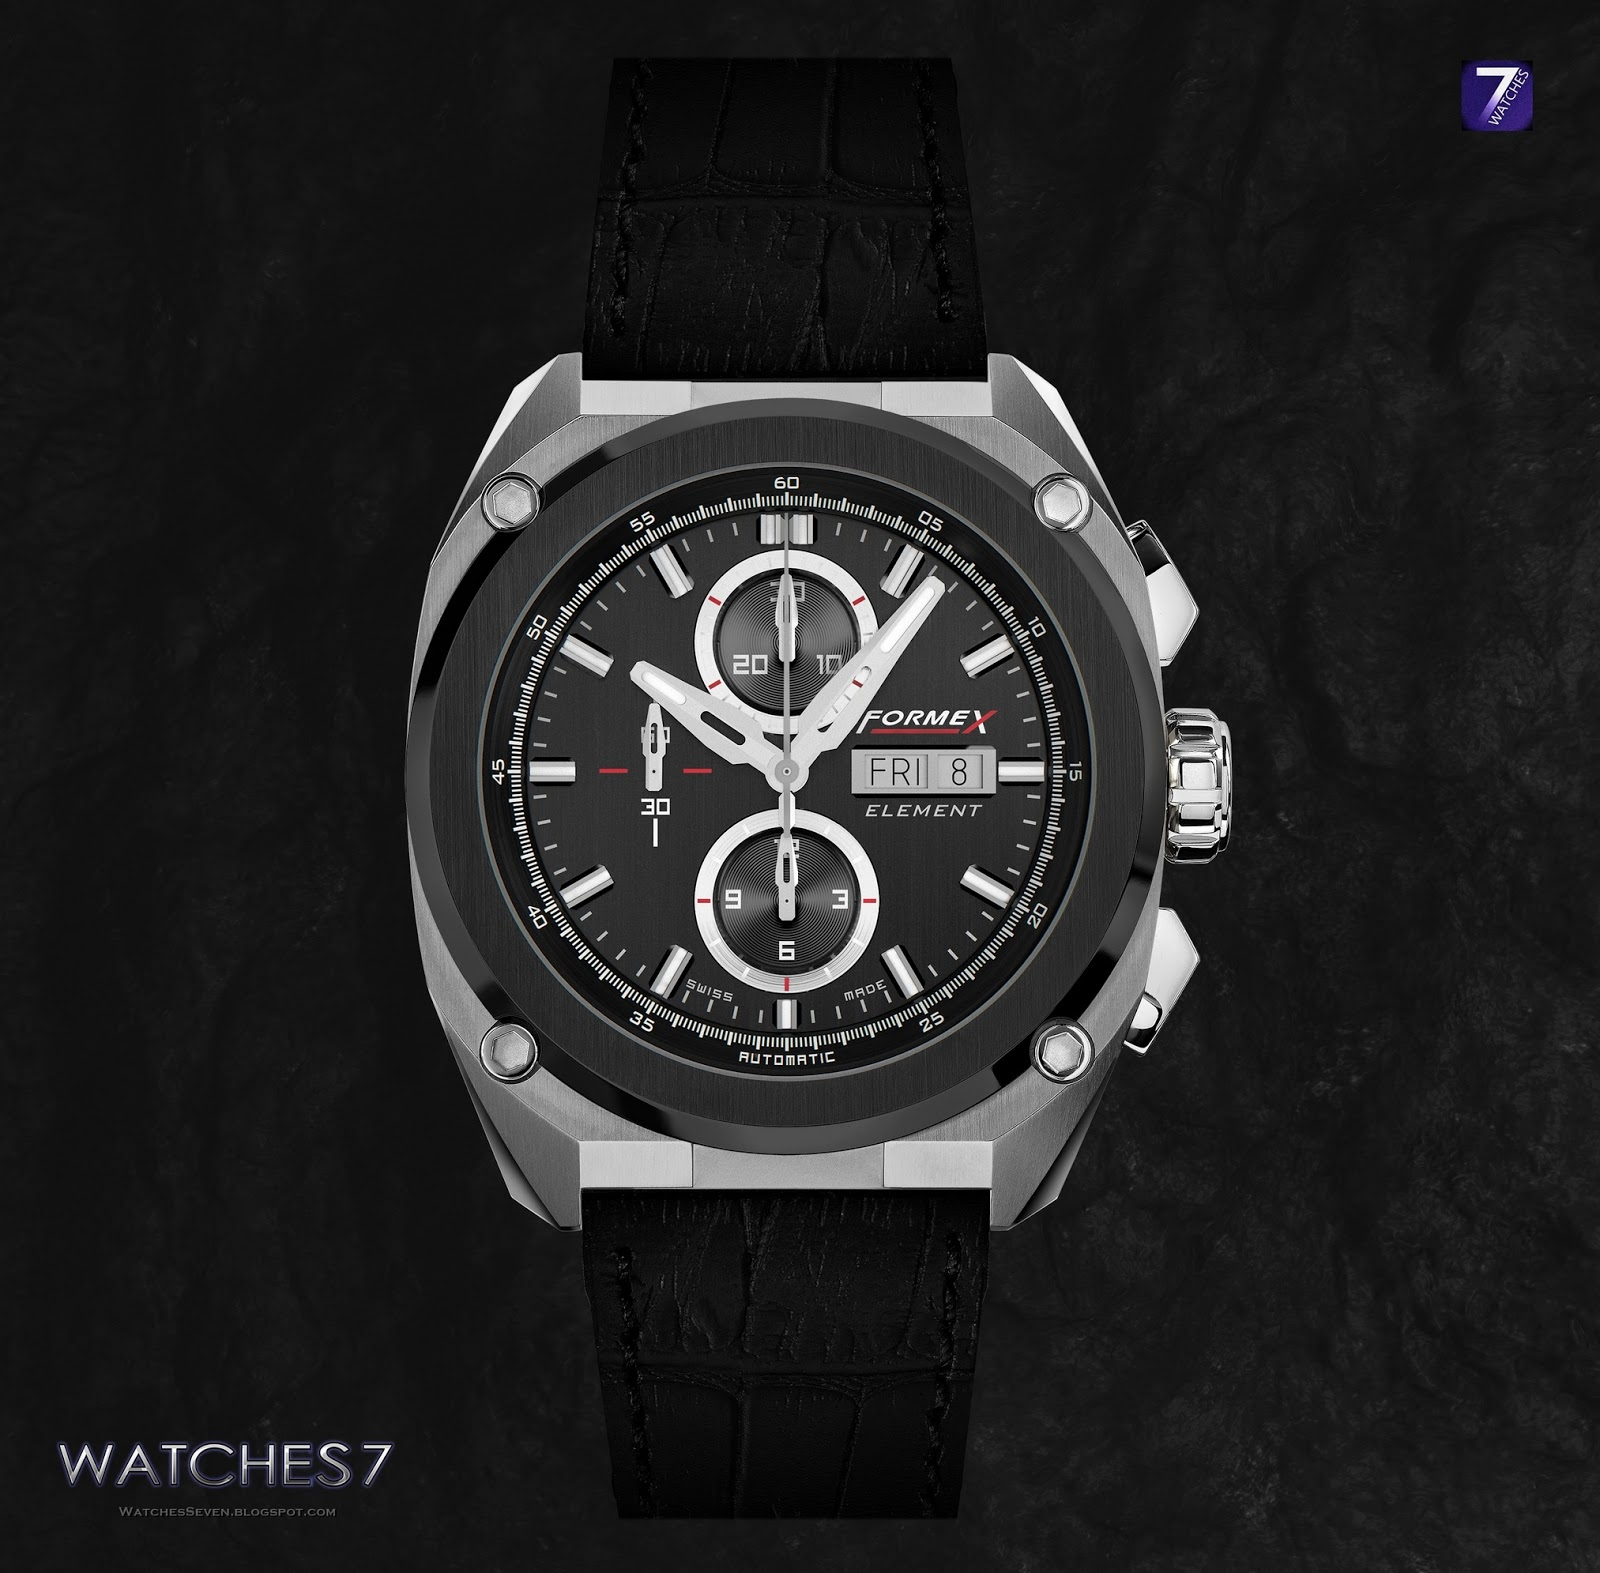 Watches 7 formex element ceramic bezel black hero for Black bezel watches